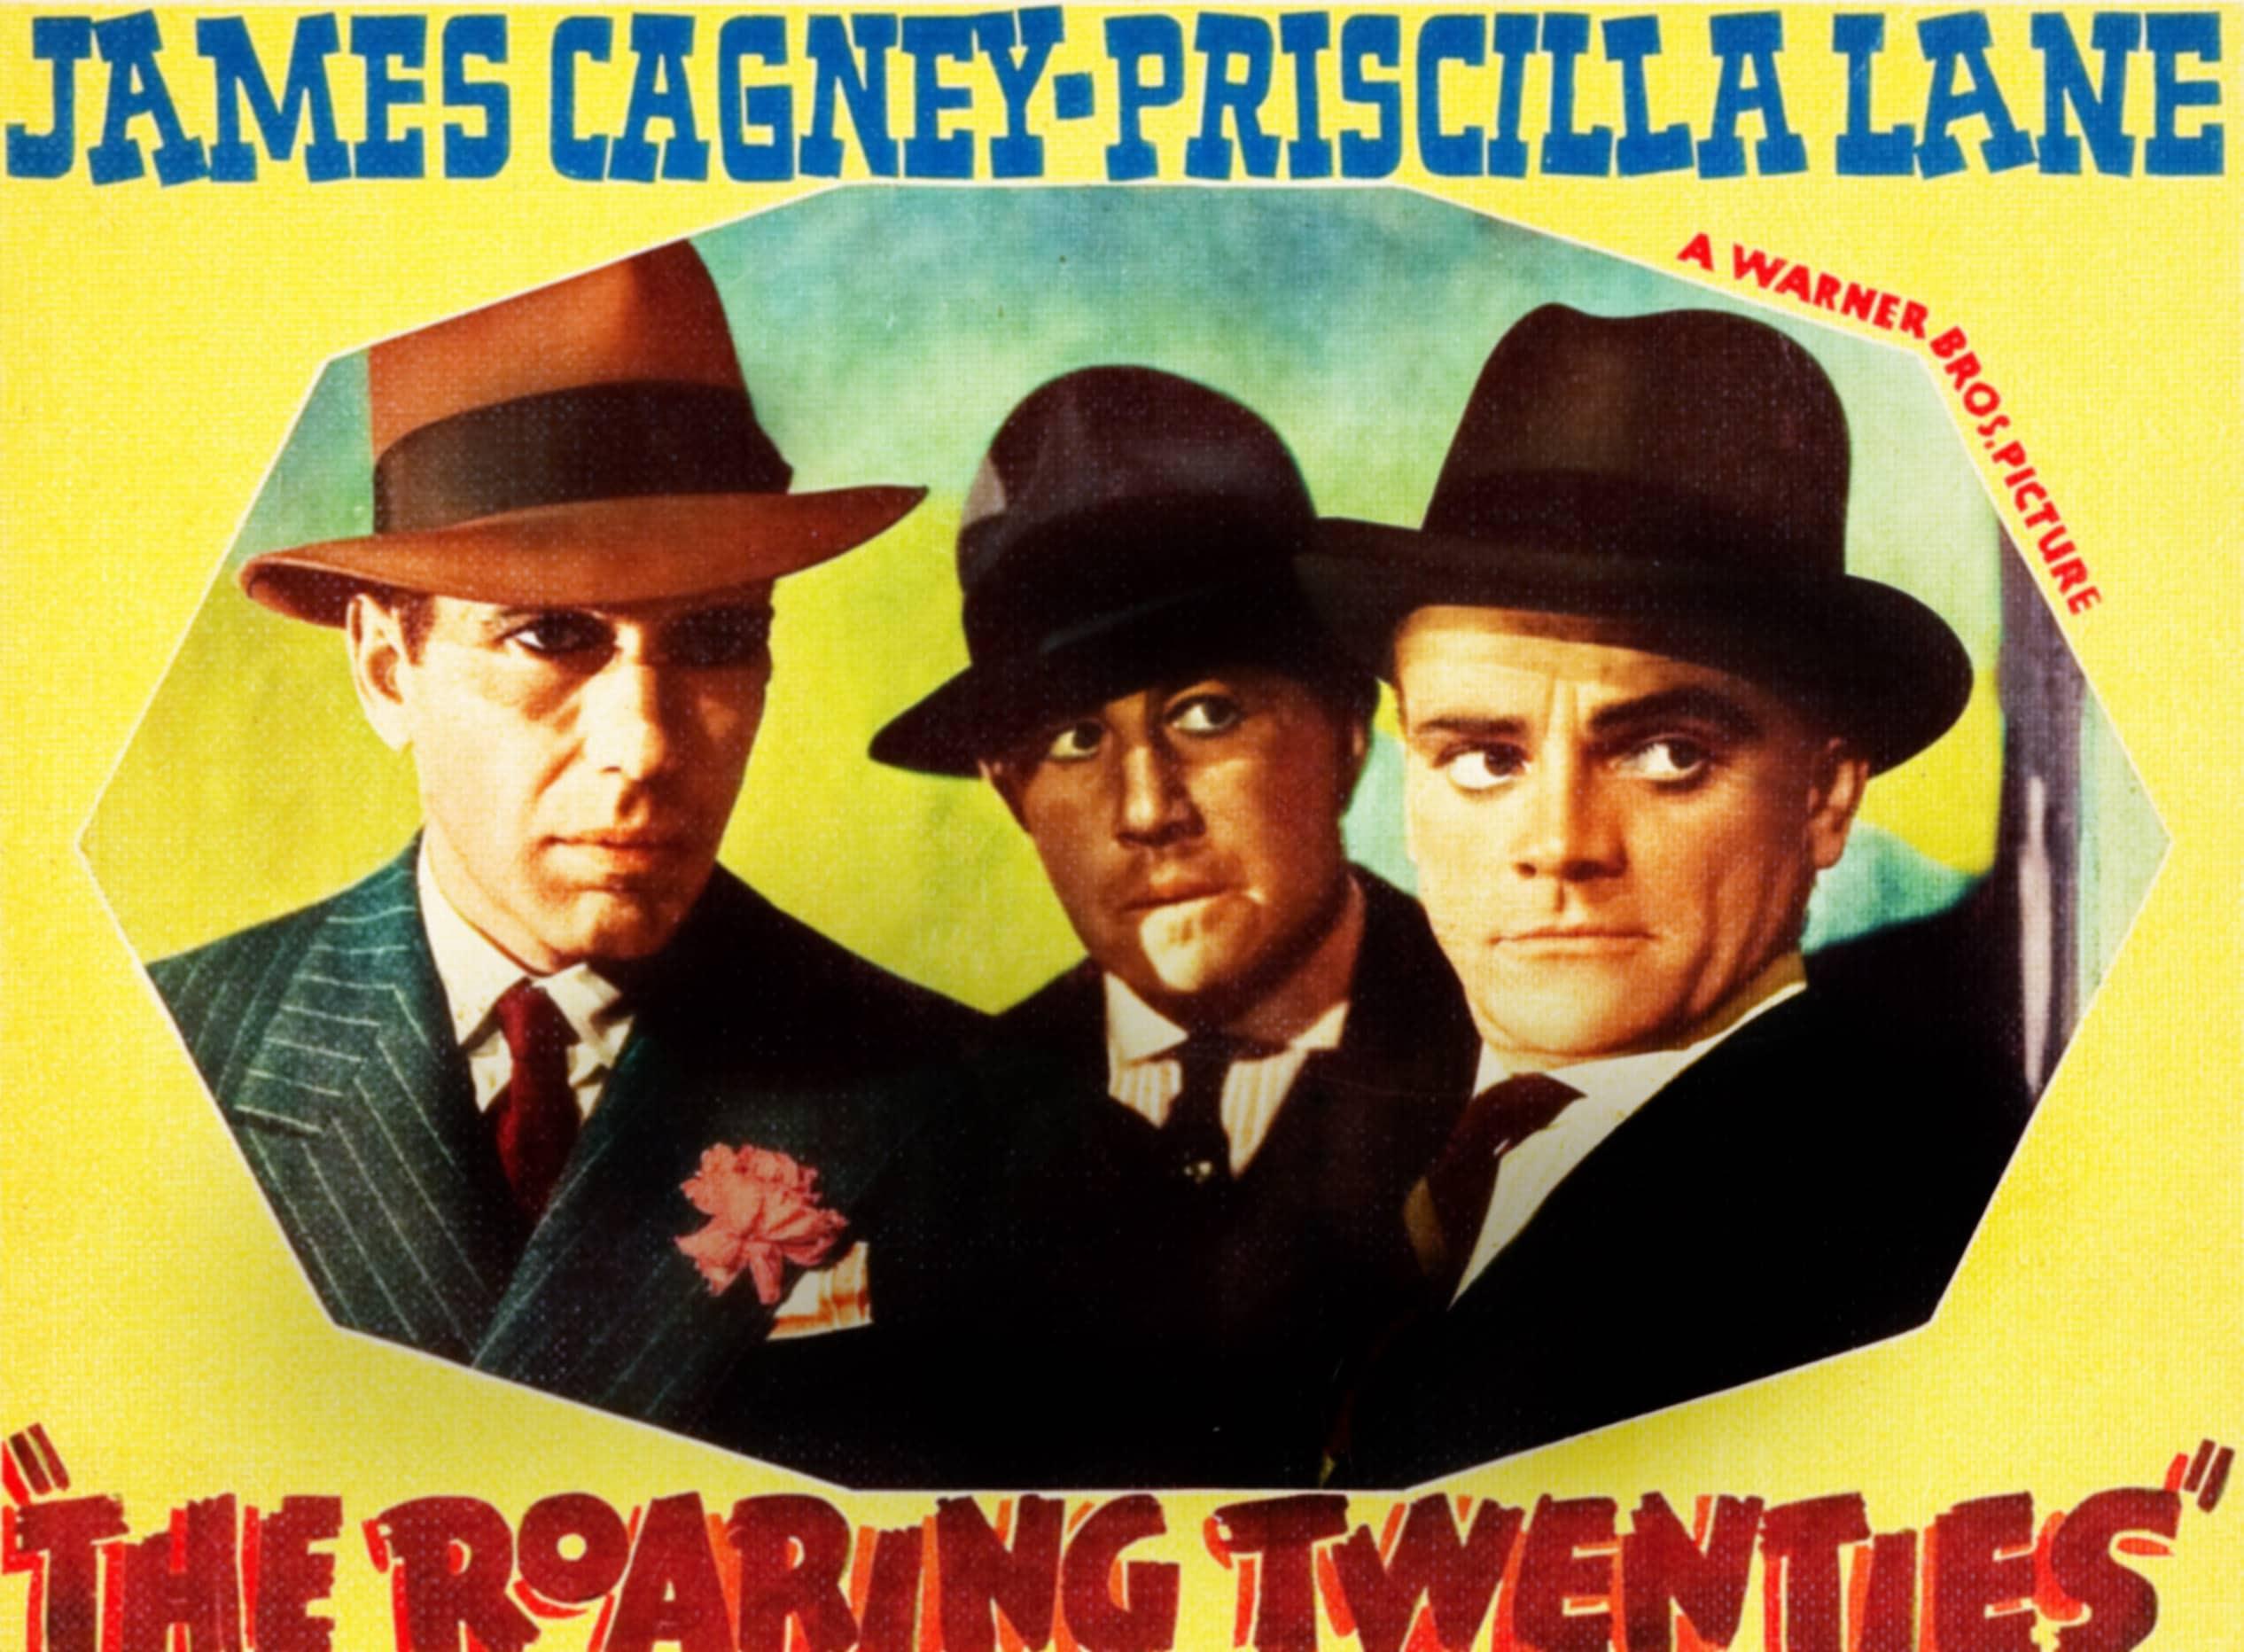 THE ROARING TWENTIES, l-r: Humphrey Bogart, Raymond Bailey, James Cagney